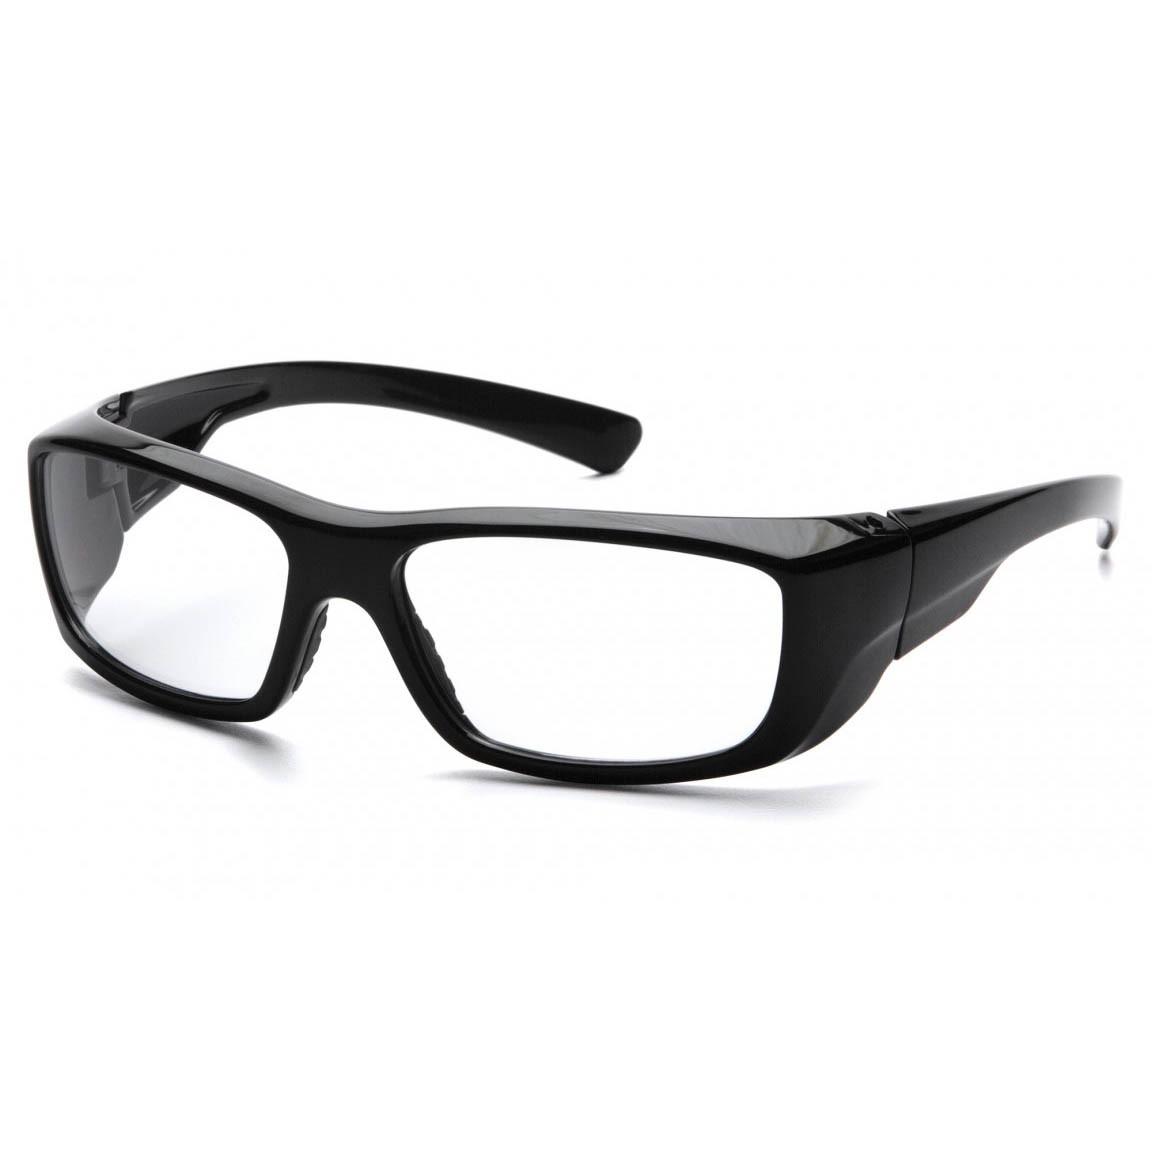 Large Frame Prescription Safety Glasses : Pyramex Emerge Safety Glasses - Black Frame - Clear RX ...